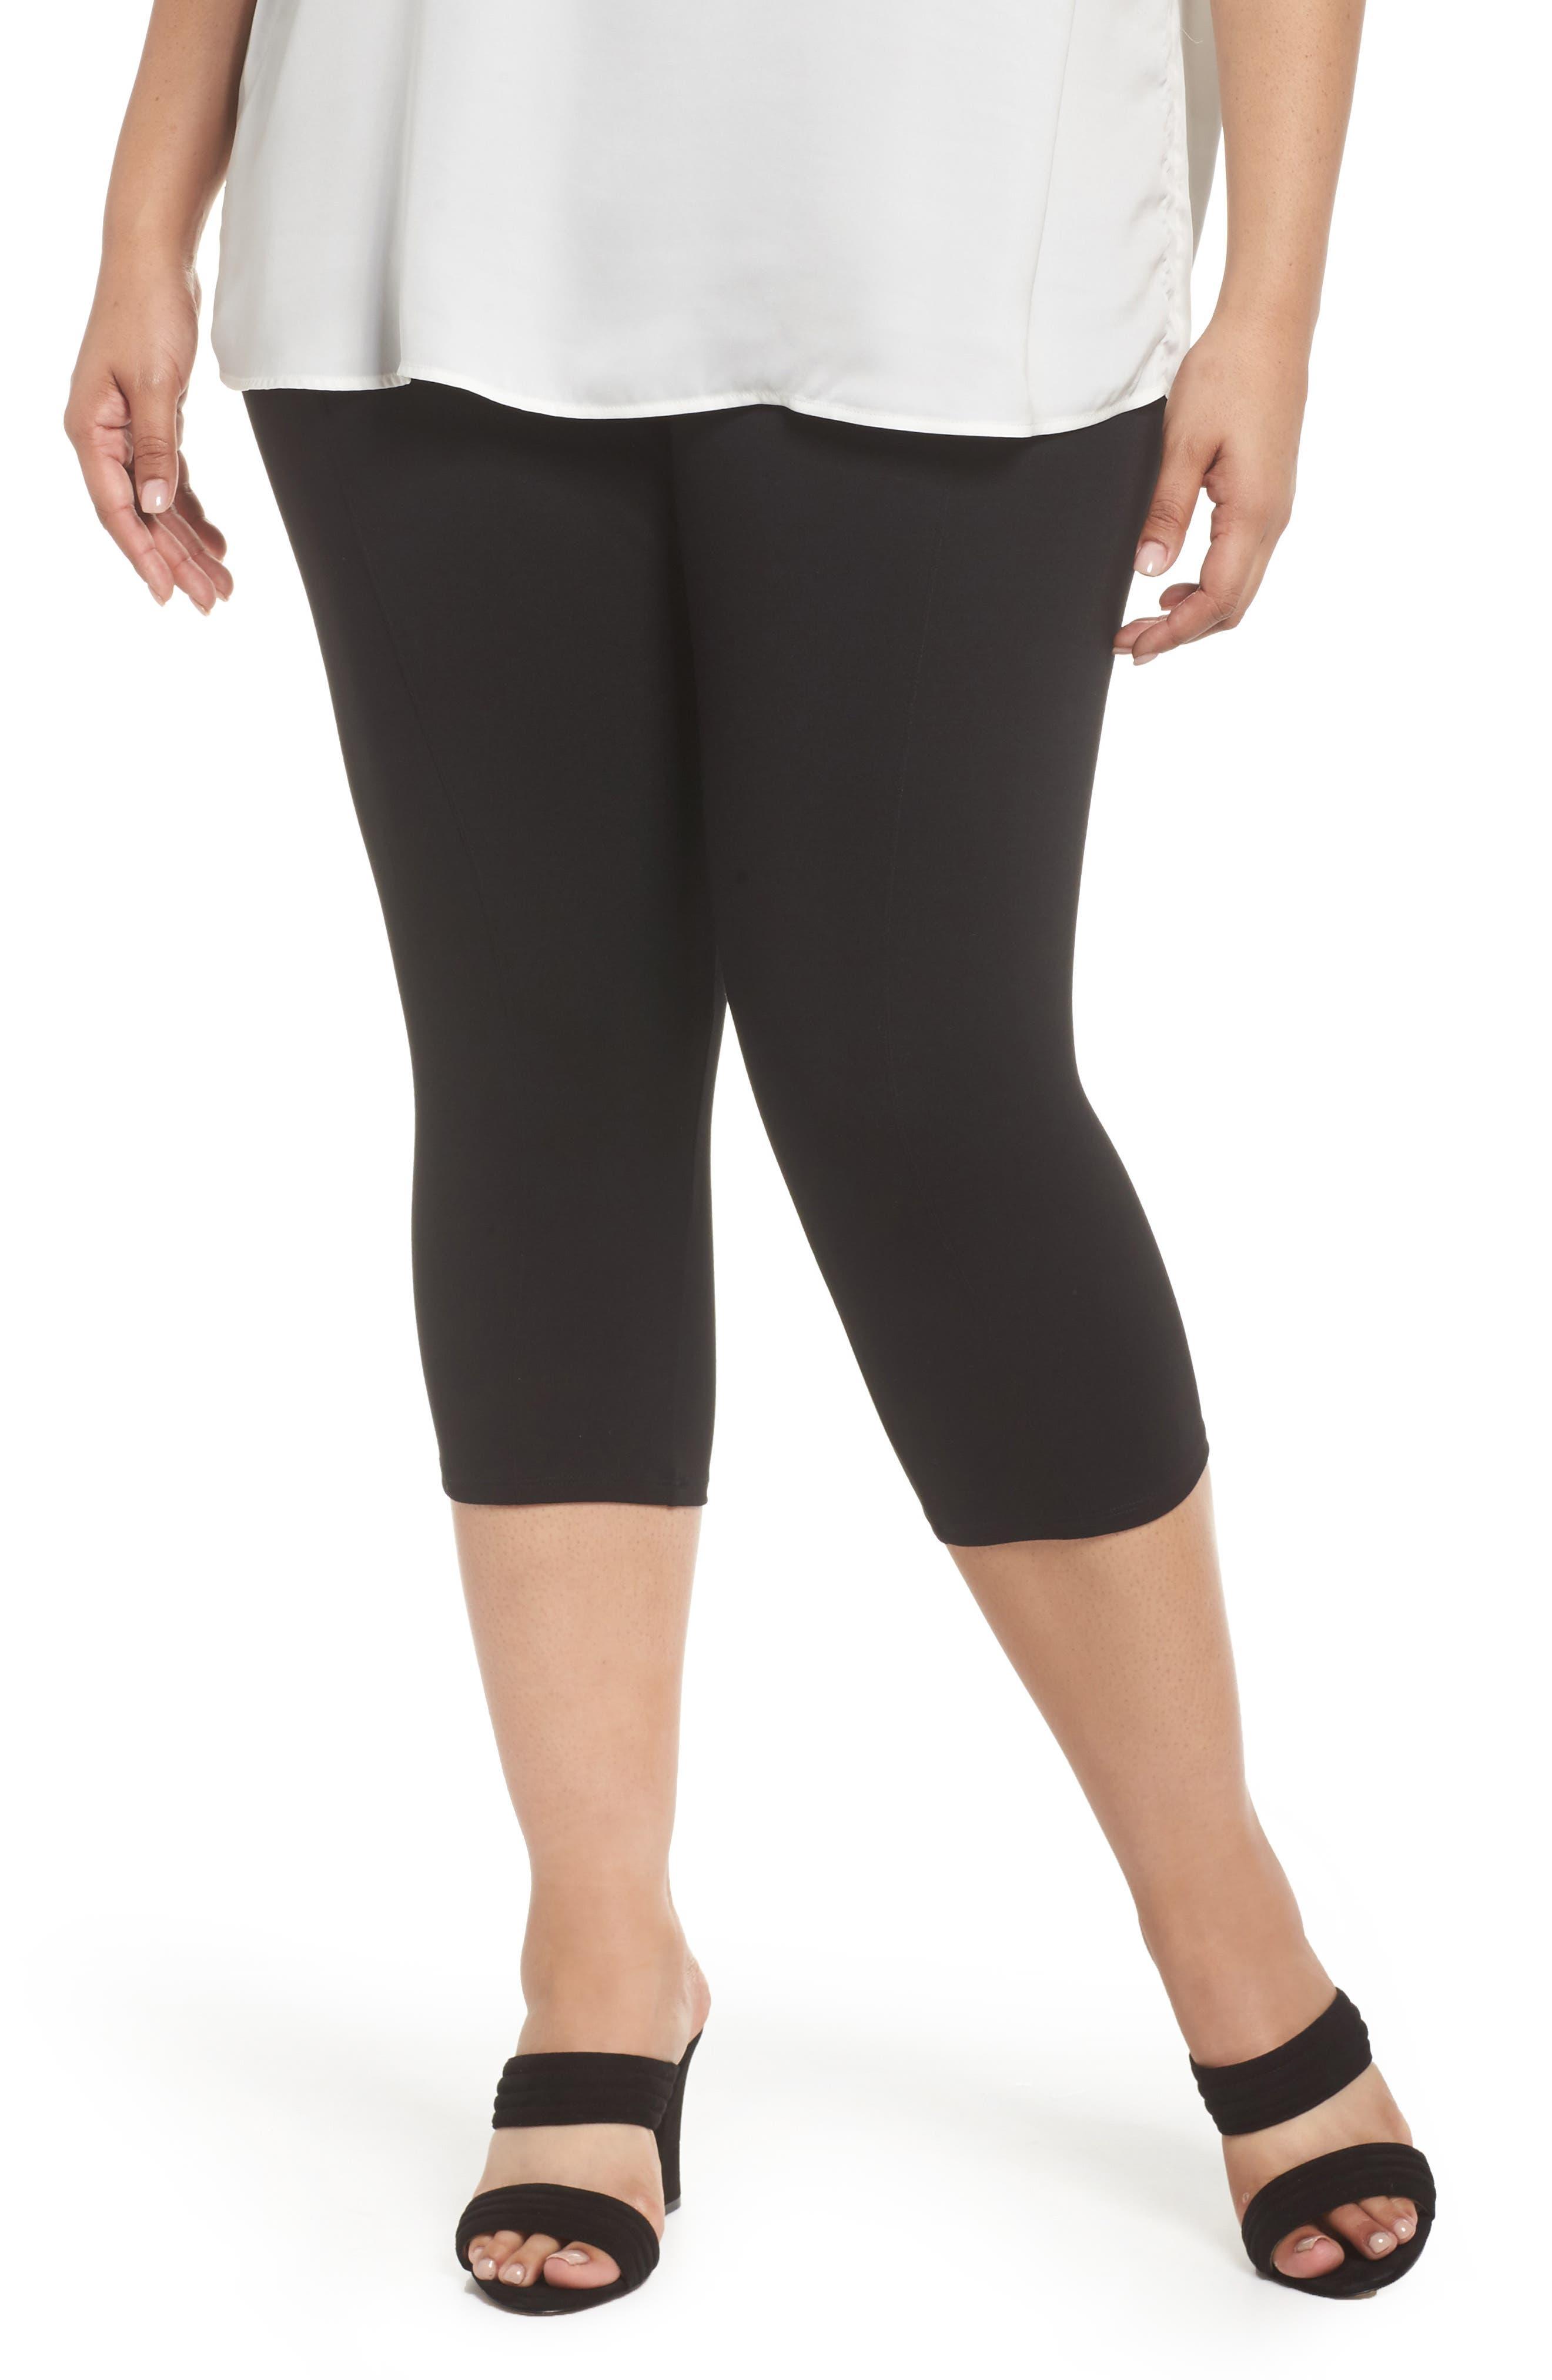 Lyssé Taylor Capri Leggings (Plus Size)